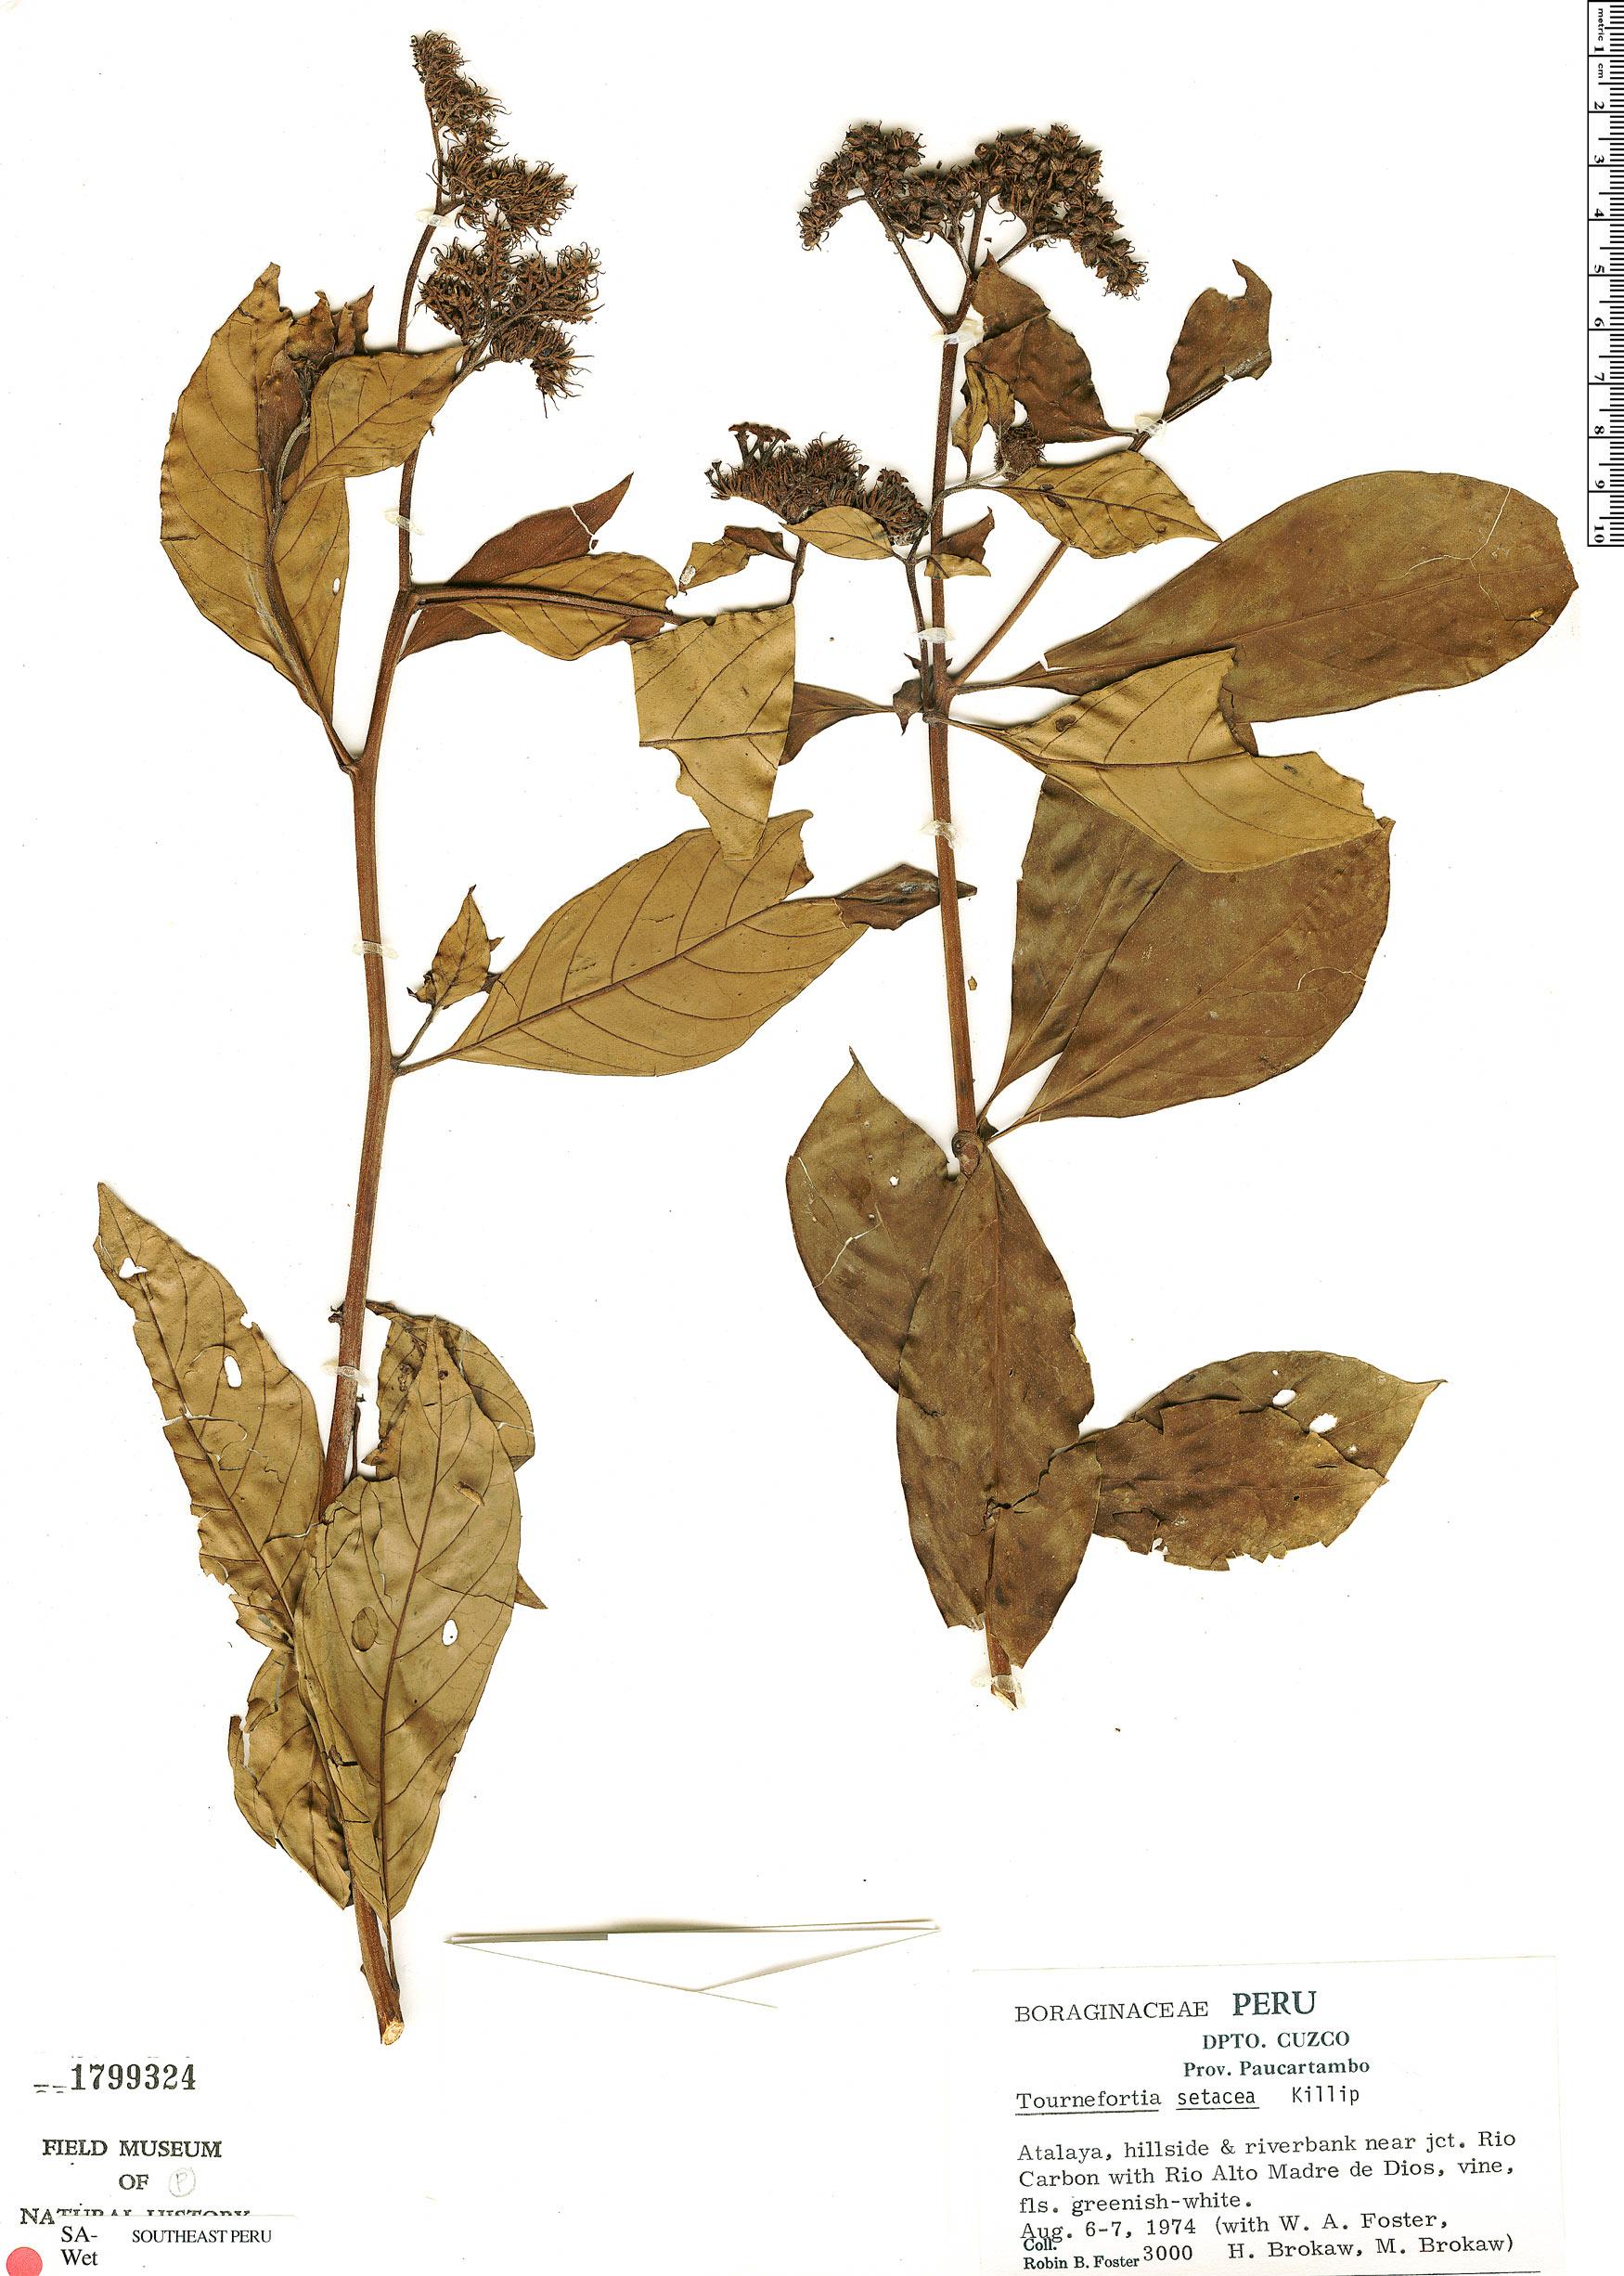 Espécime: Tournefortia setacea